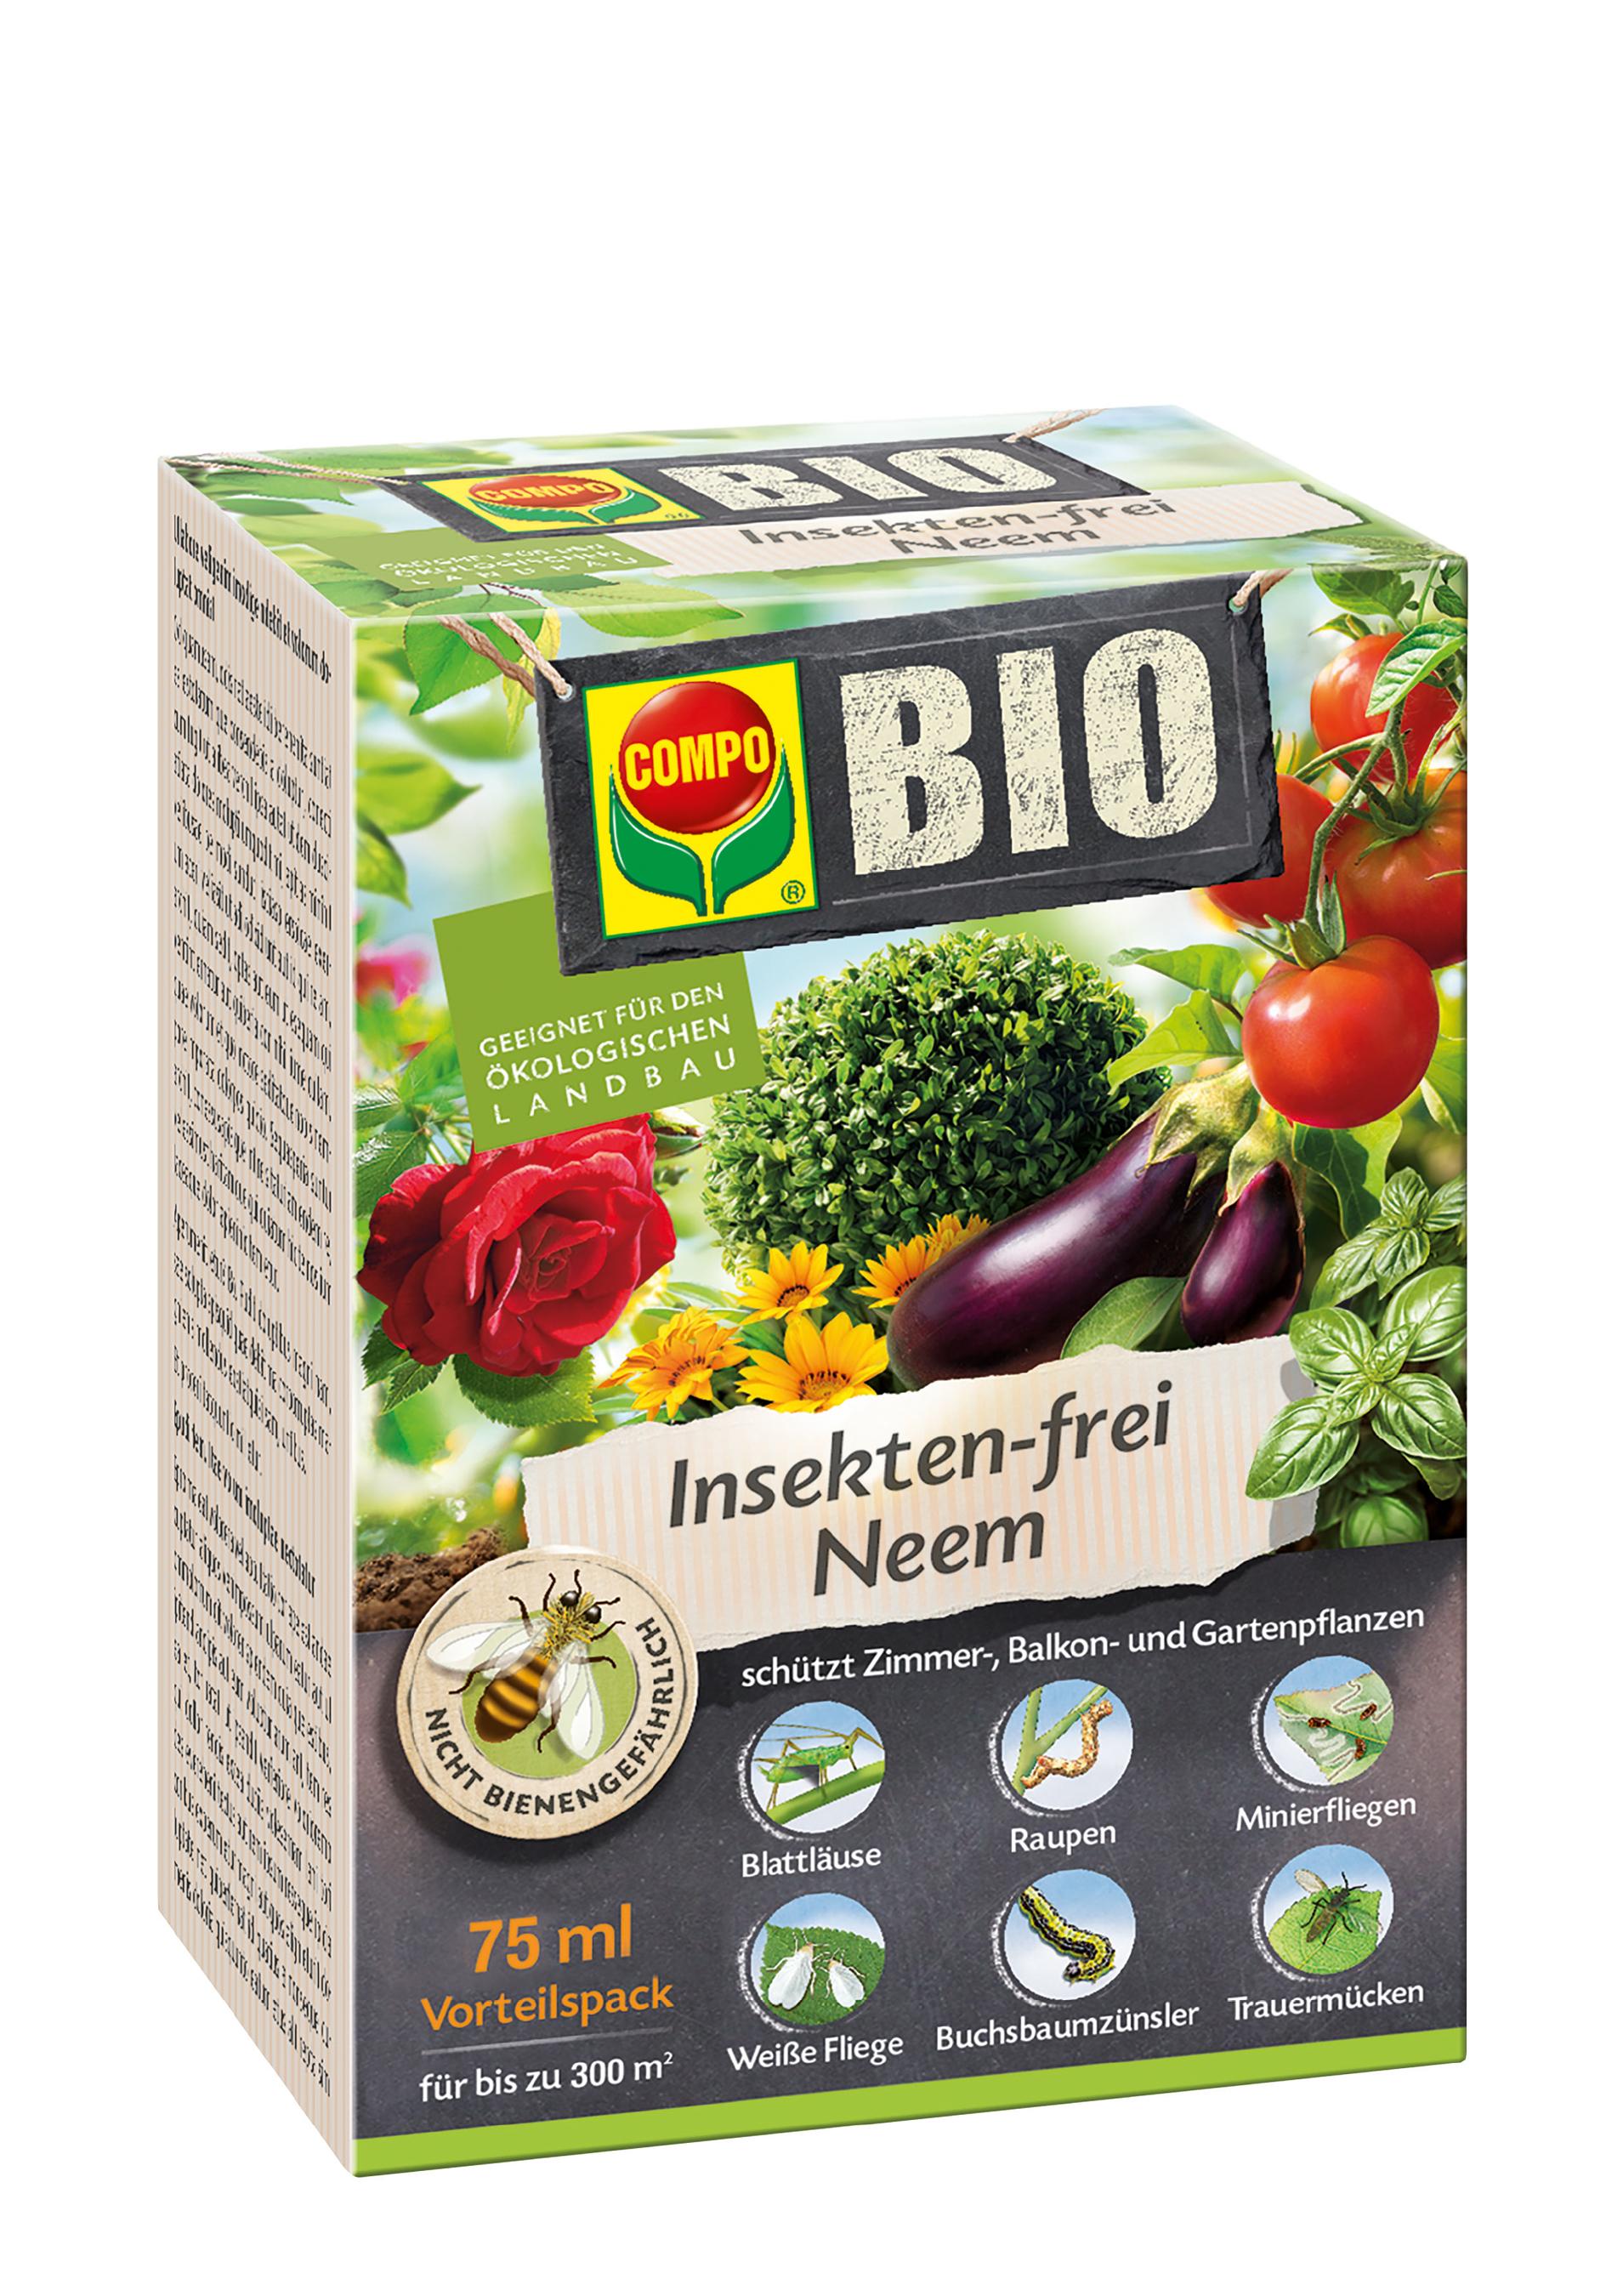 COMPO BIO Insekten-frei Neem 75ml Bild 1